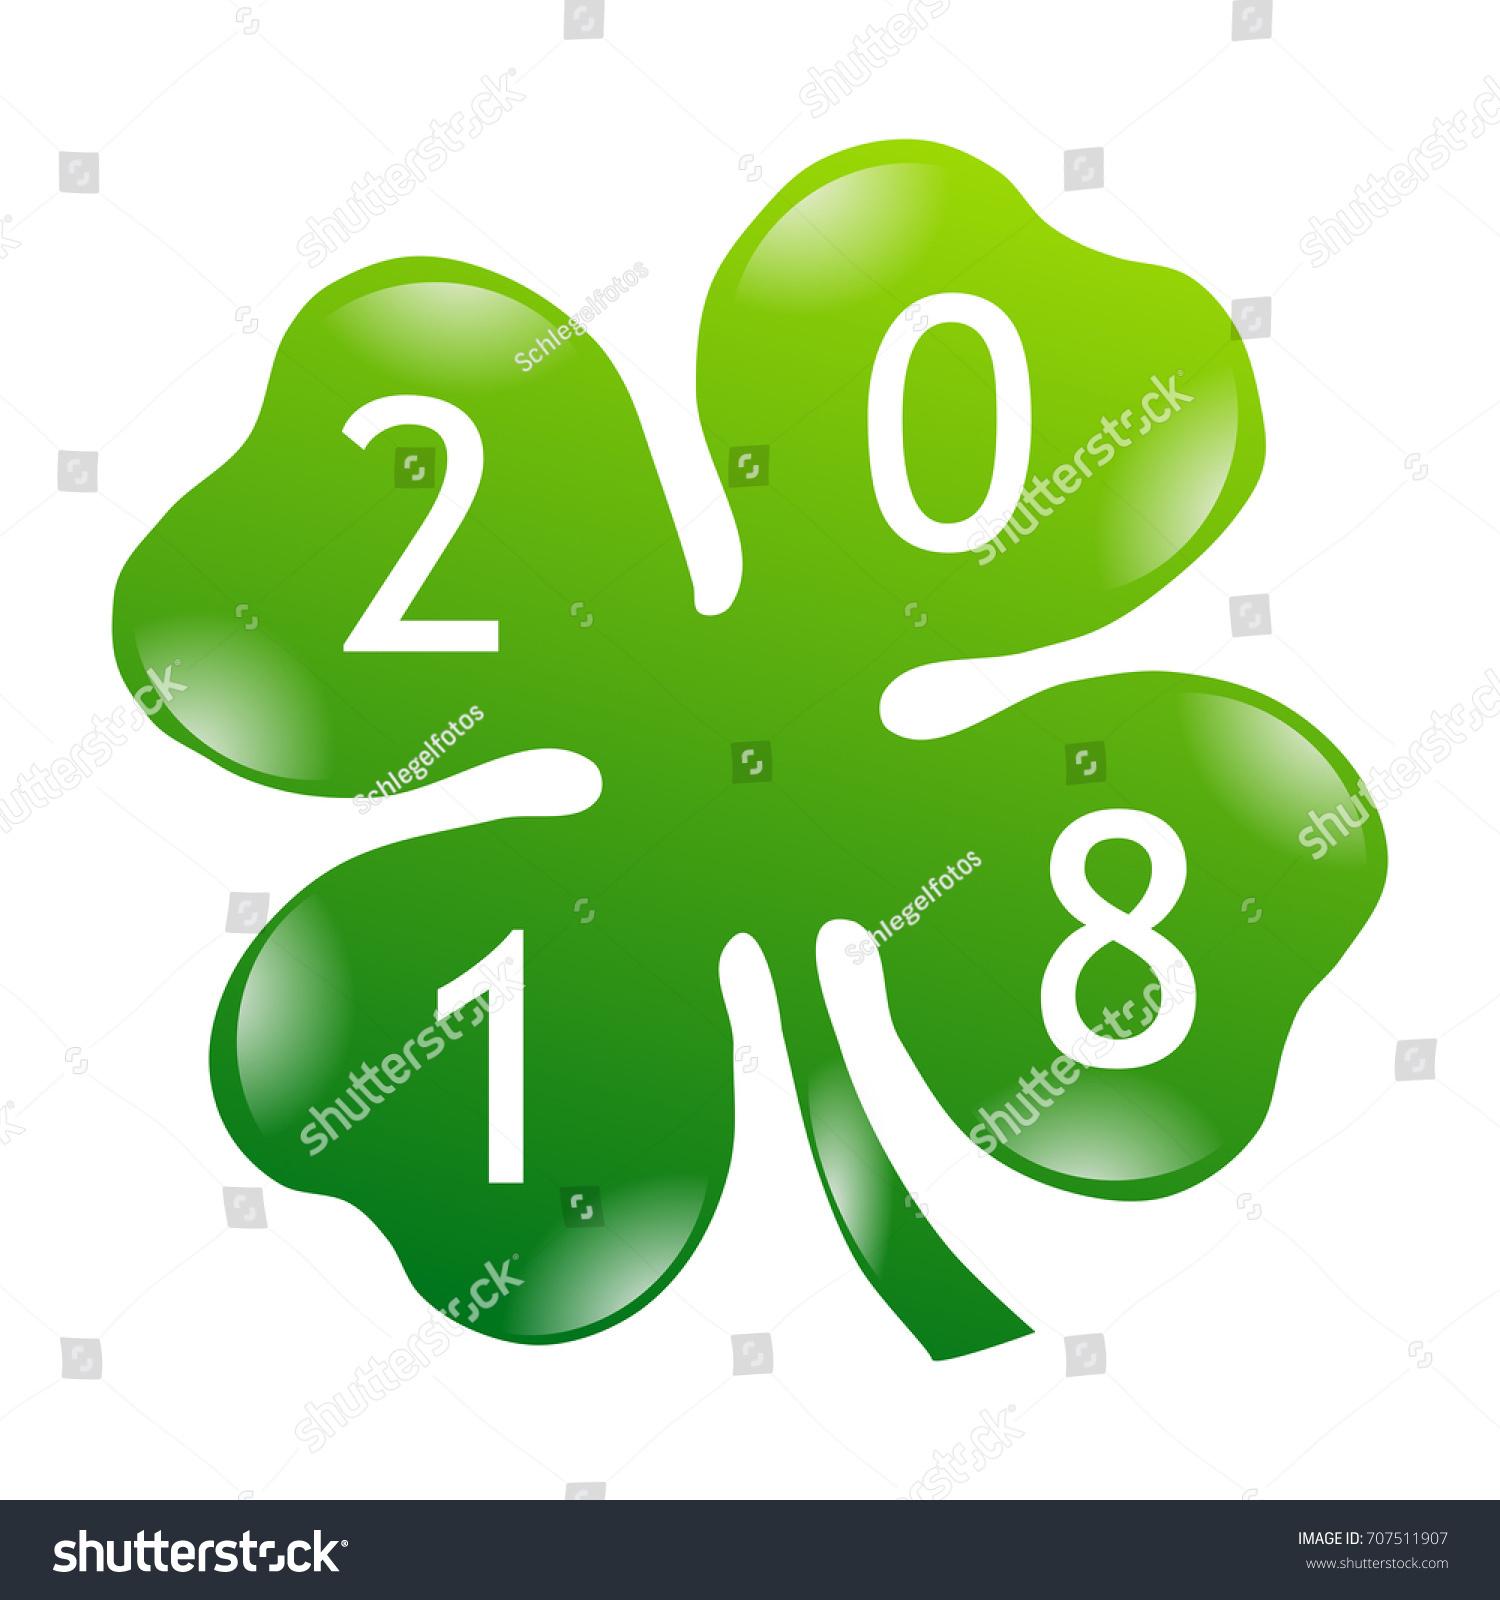 Uncategorized Lucky Symbol shamrock 2018 lucky symbol stock illustration 707511907 shutterstock symbol